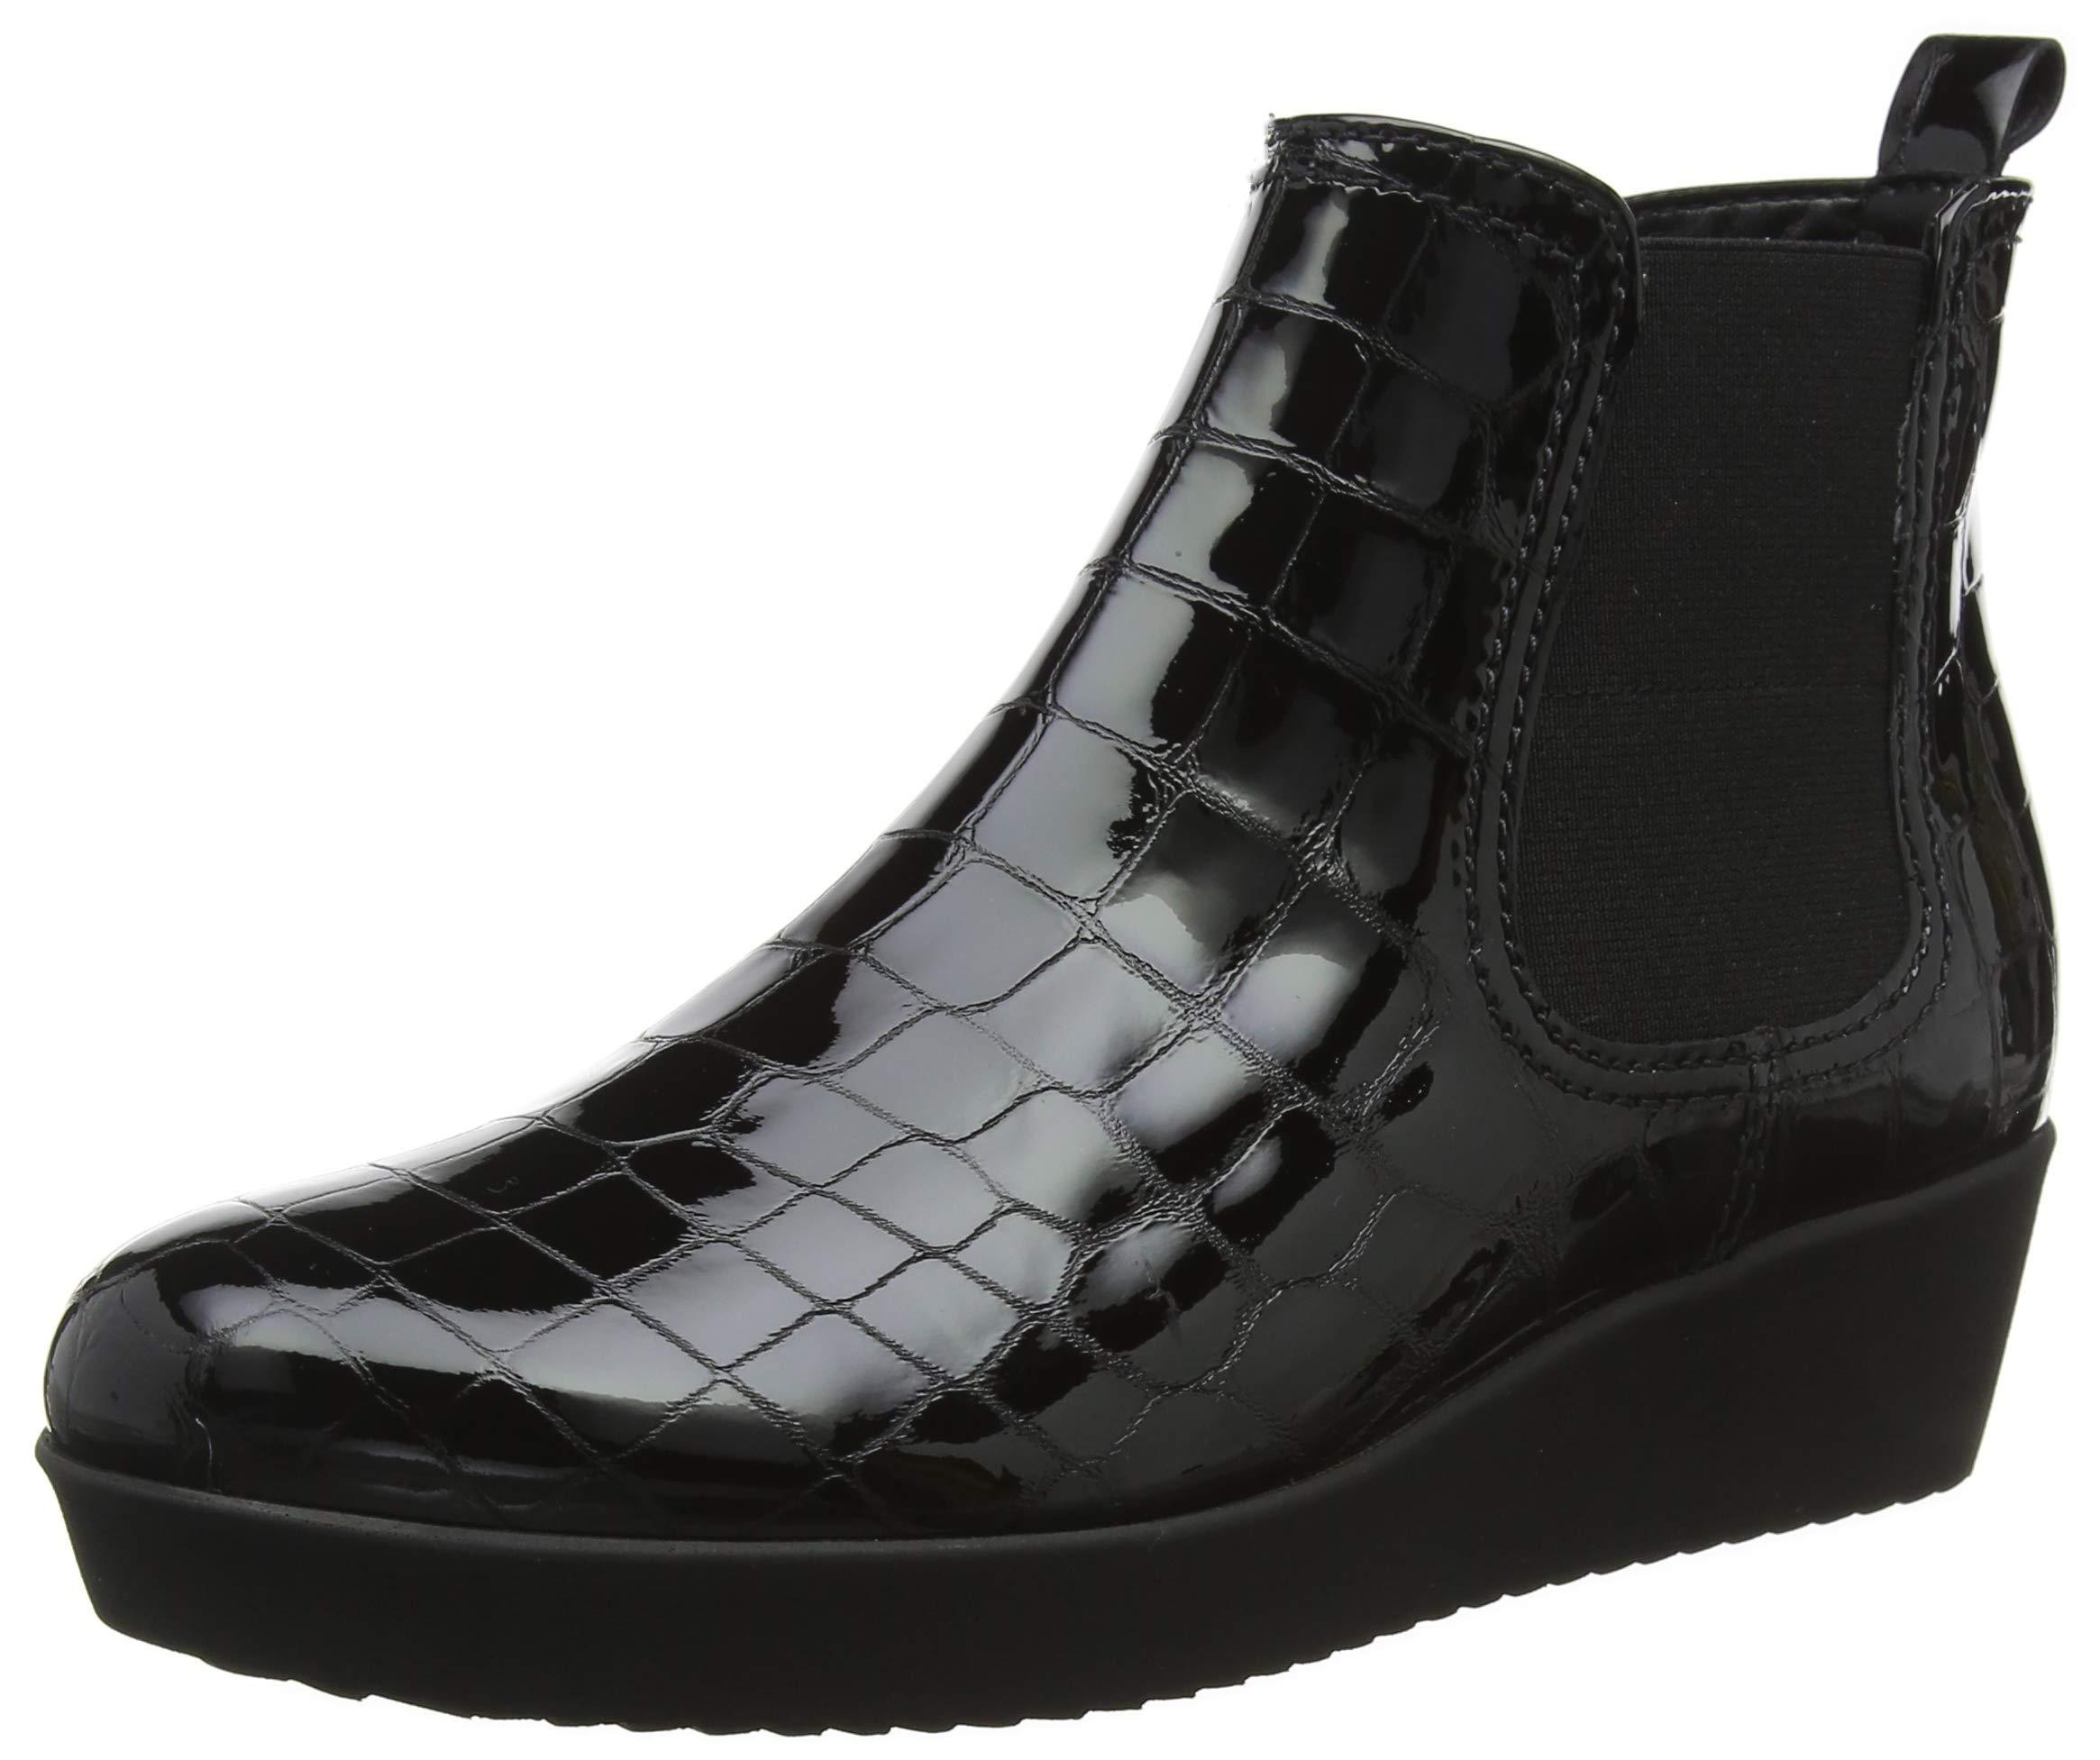 Gabor Shoes Eu FemmeNoirschwarzmicro9738 Comfort BasicBotines WEDI9H2